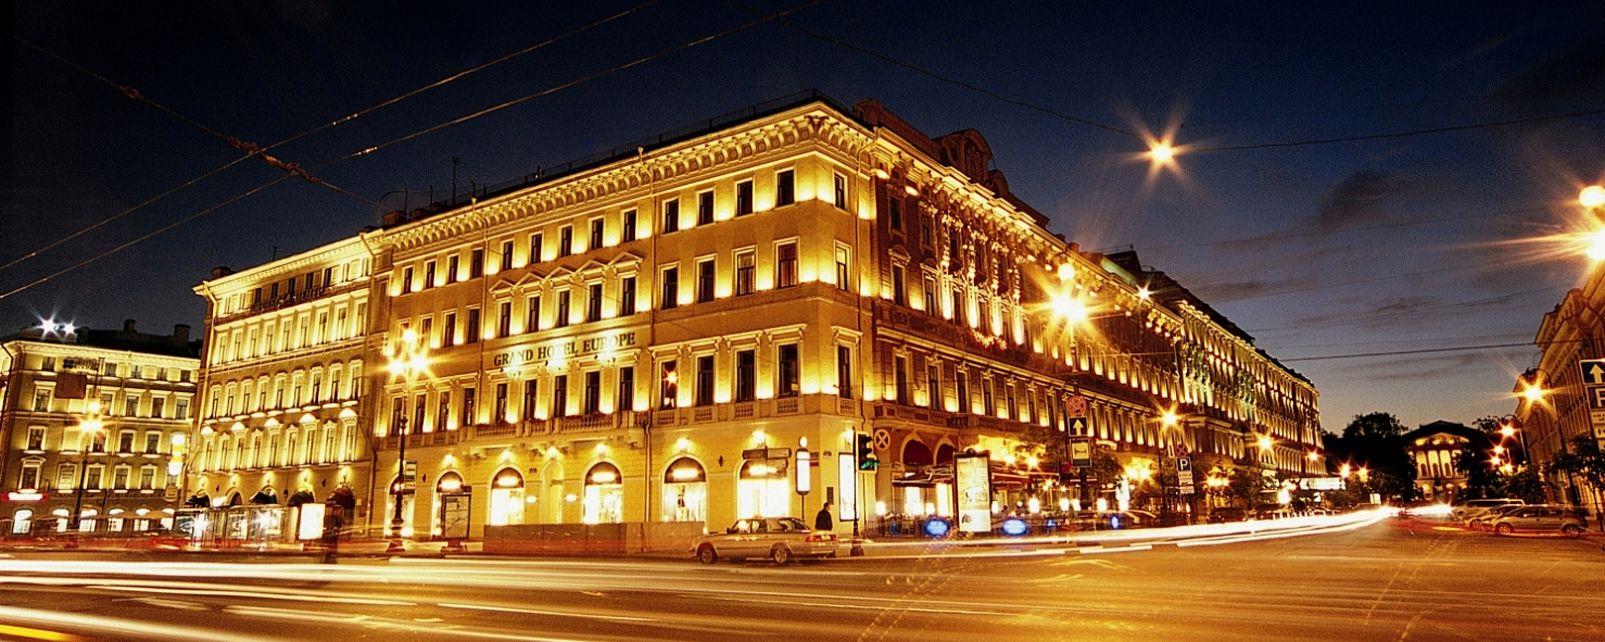 Hôtel Belmond Grand Europe